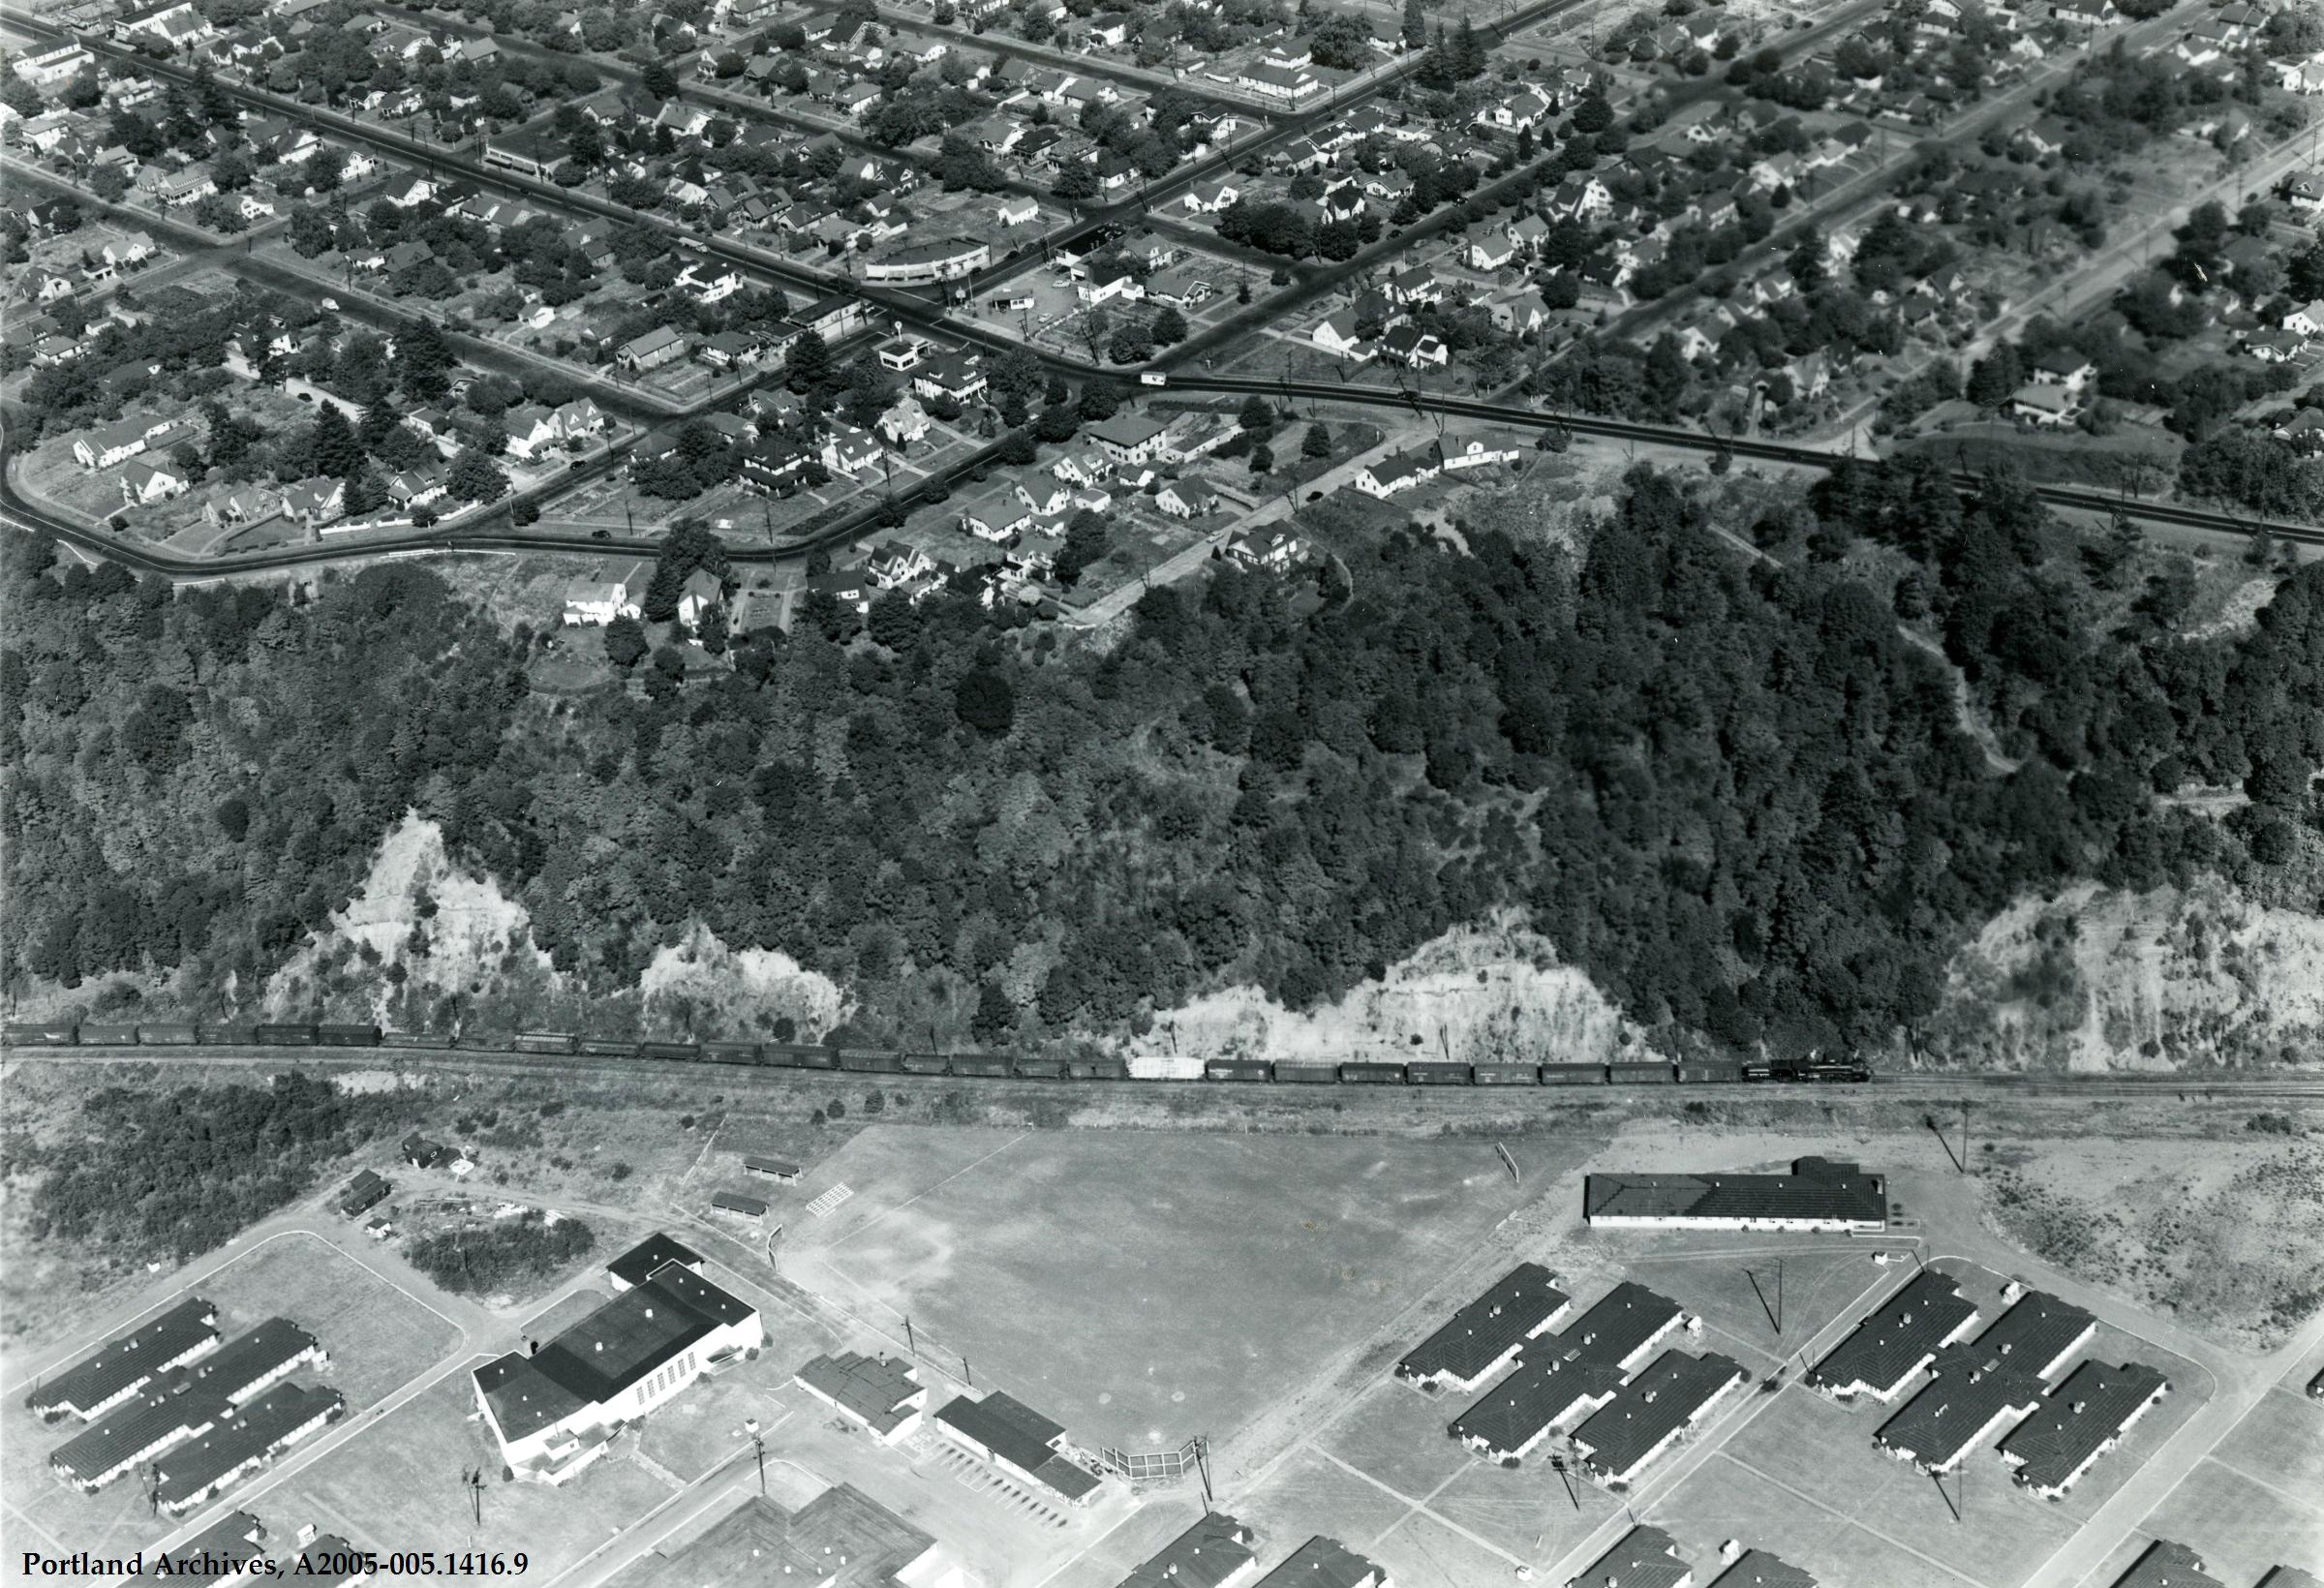 Aerial of Mocks Bottom Barrack, circa 1945: A2005-005.1416.9